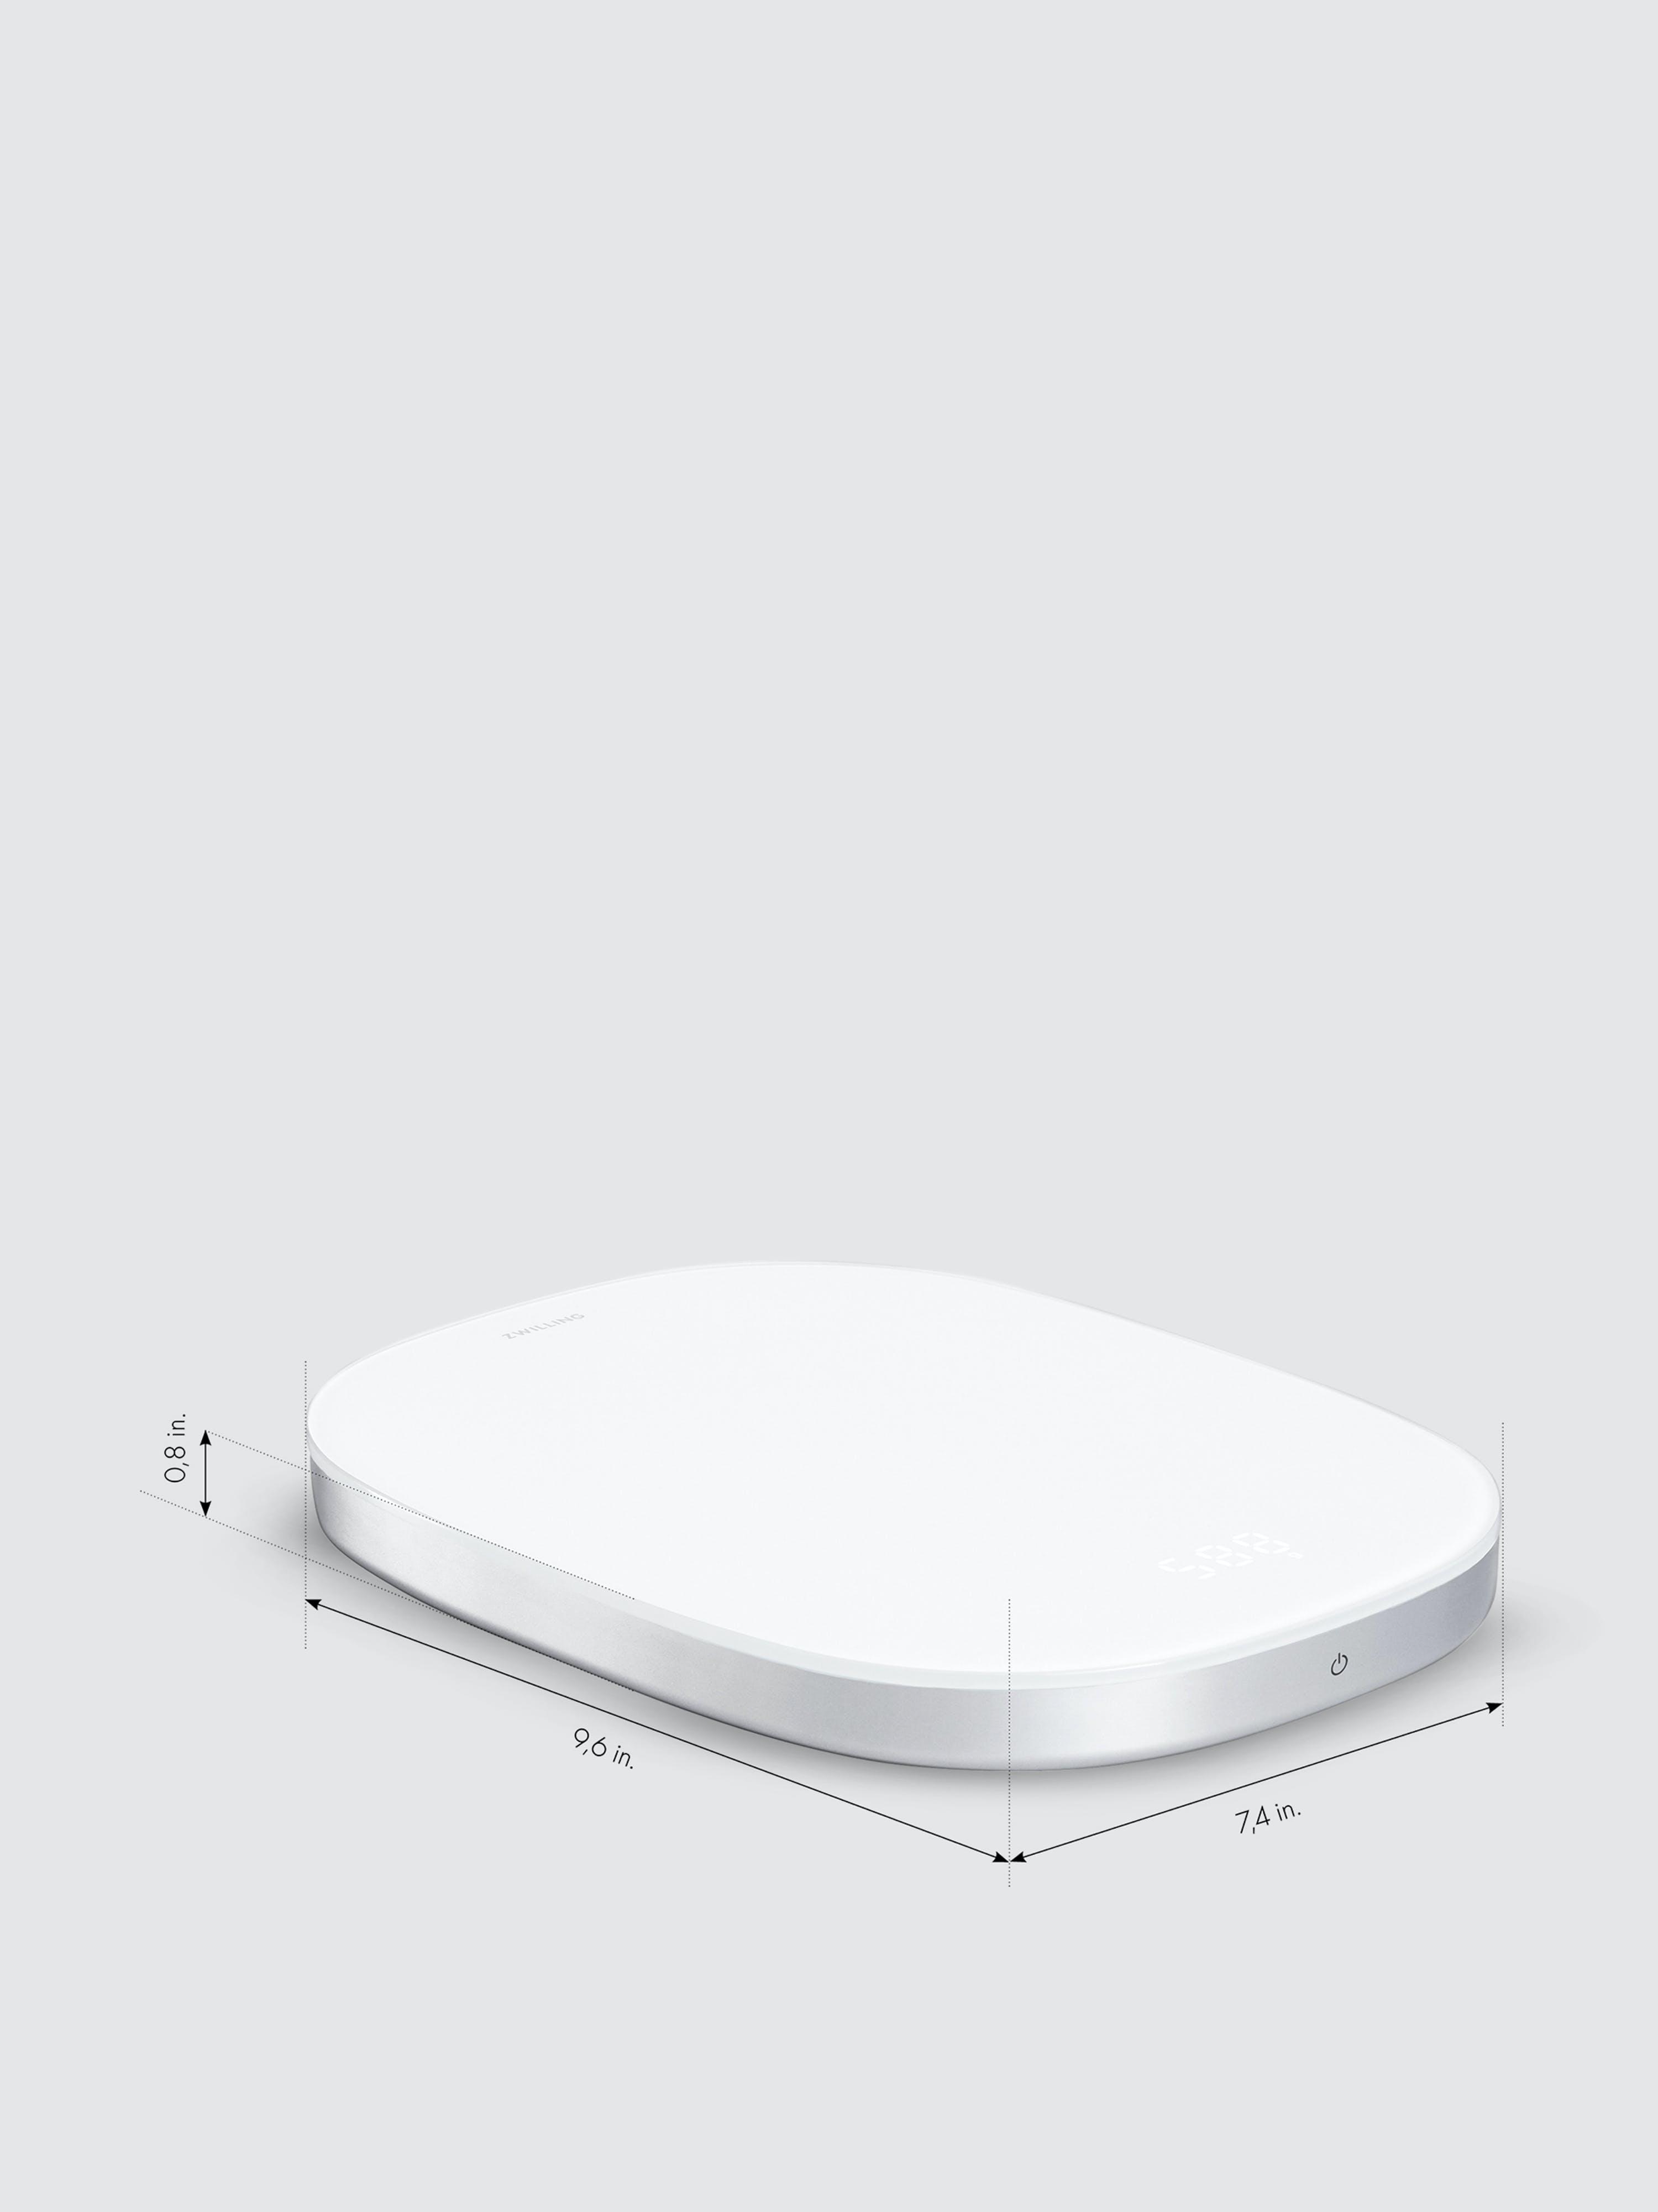 Zwilling - Verified Partner Zwilling Enfinigy Digital Kitchen Scale  - White